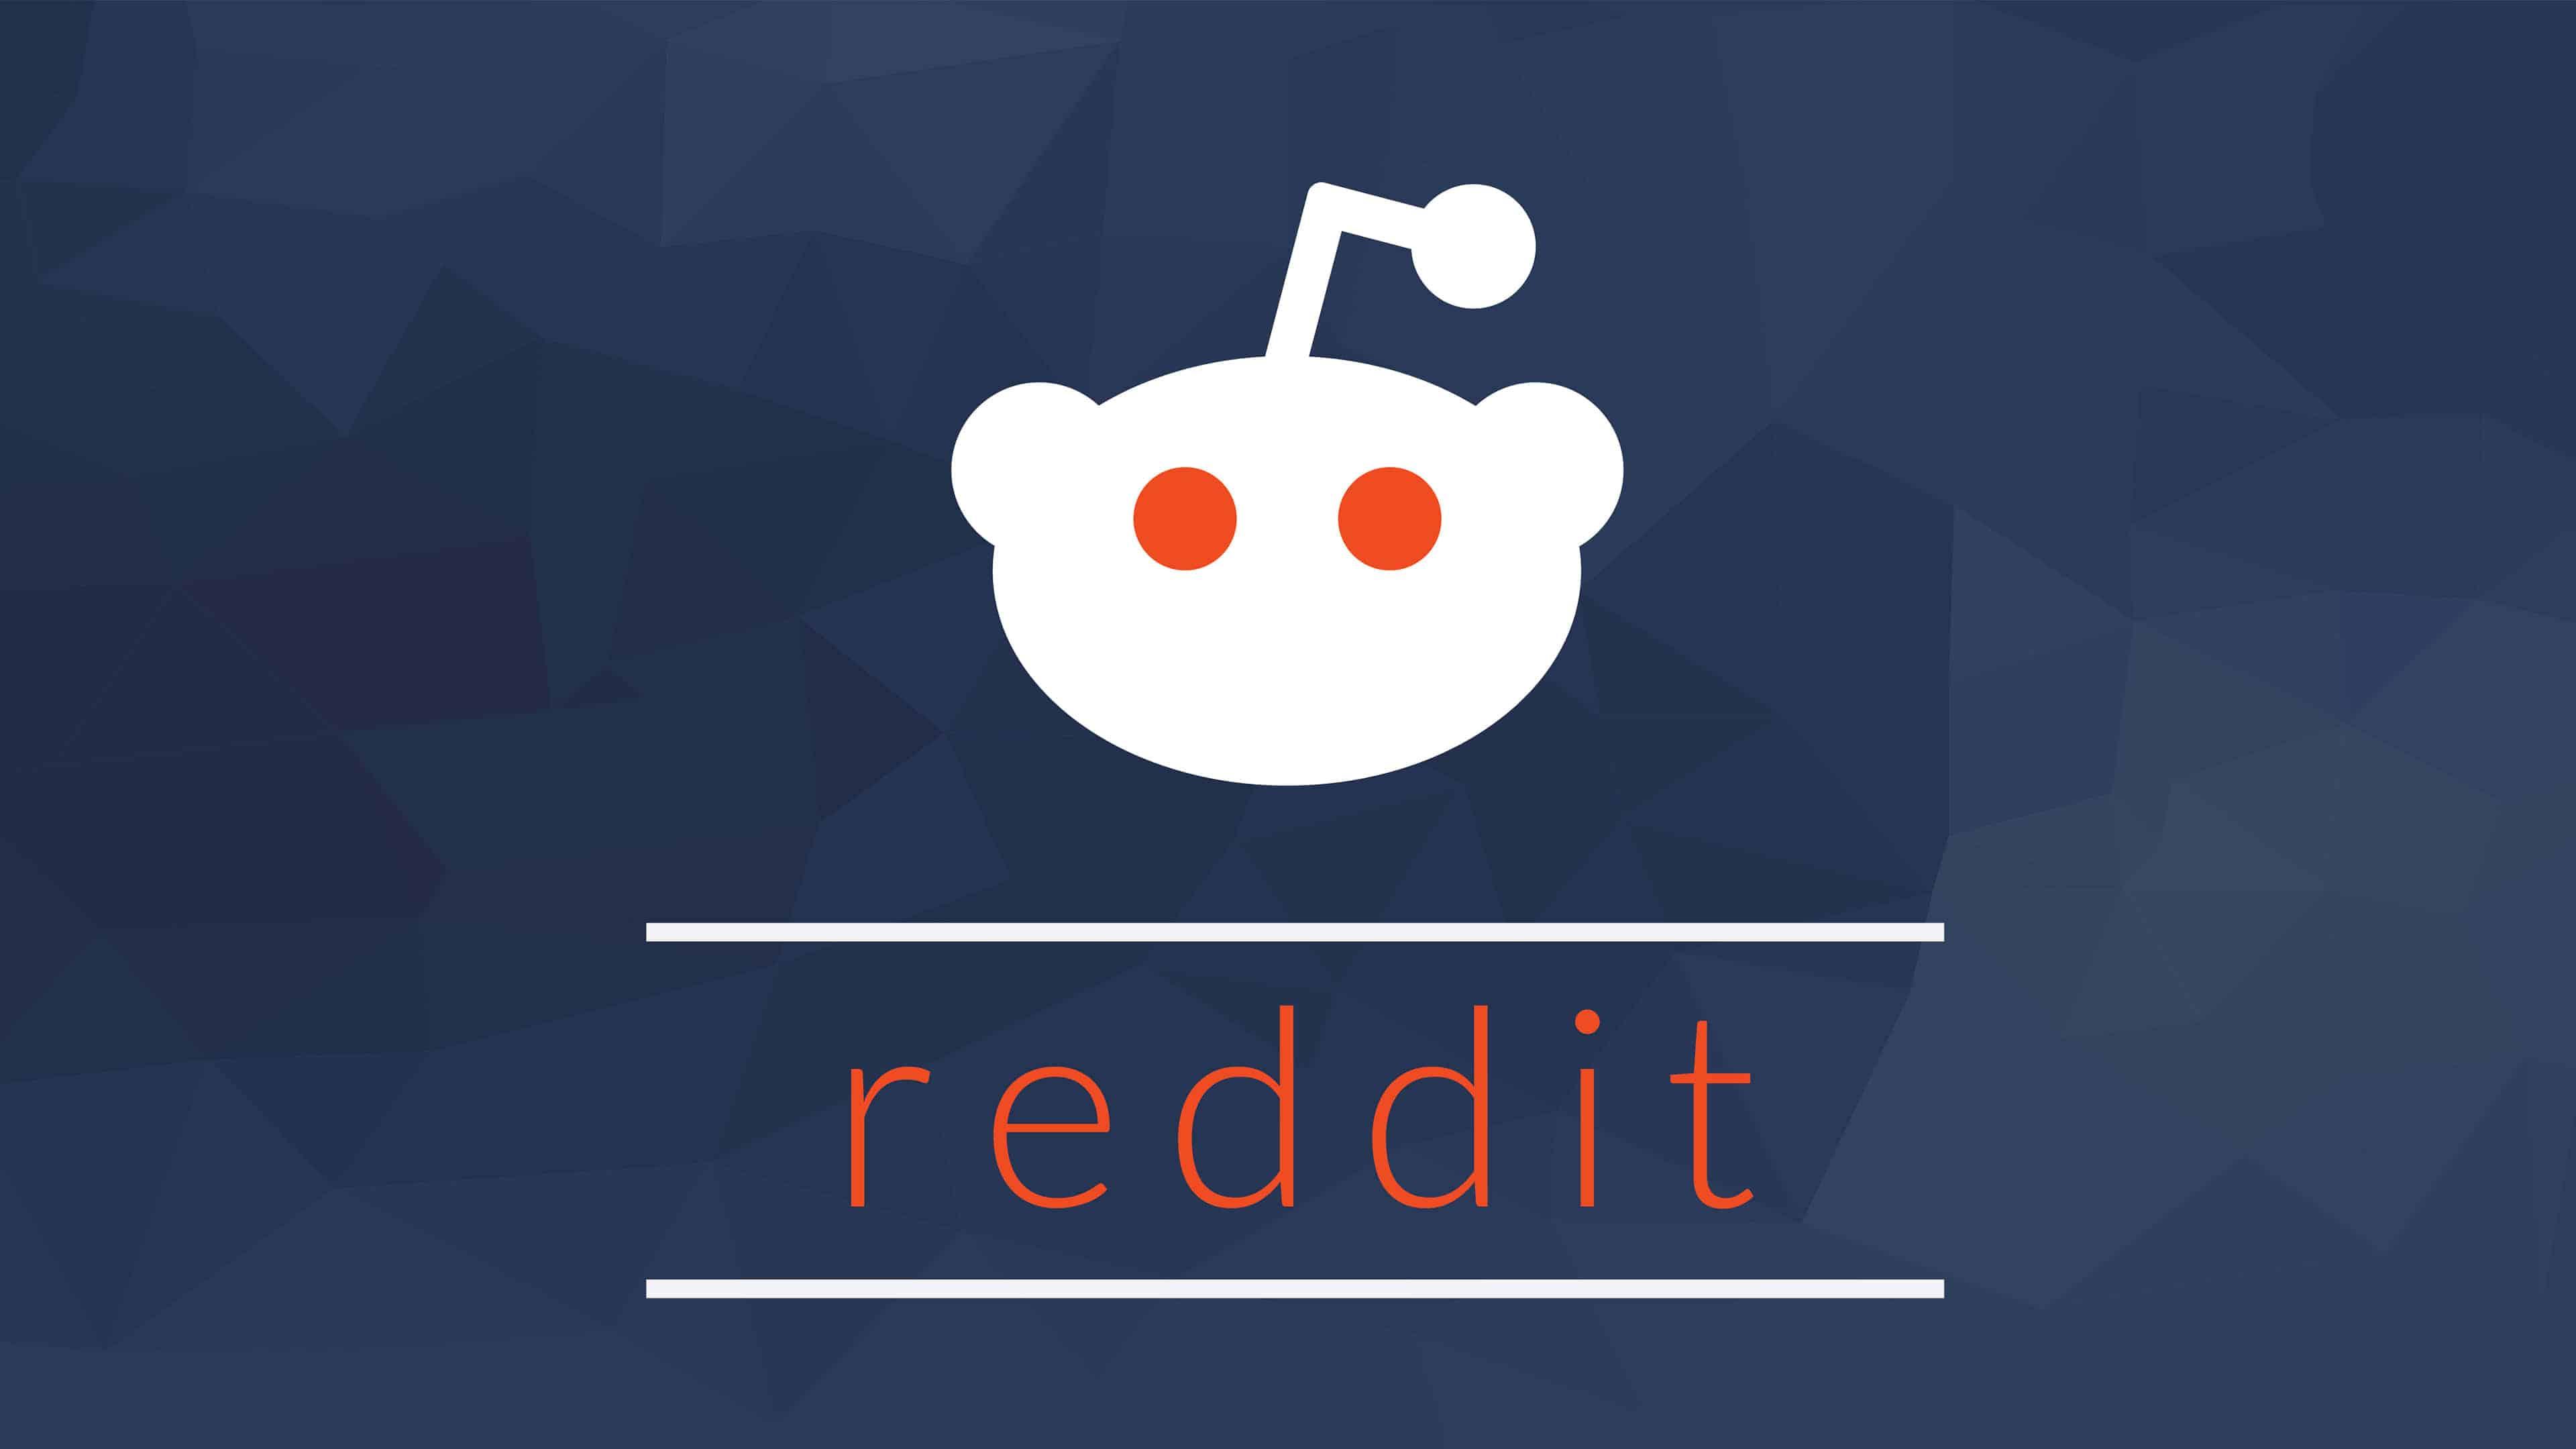 Reddit ama logo